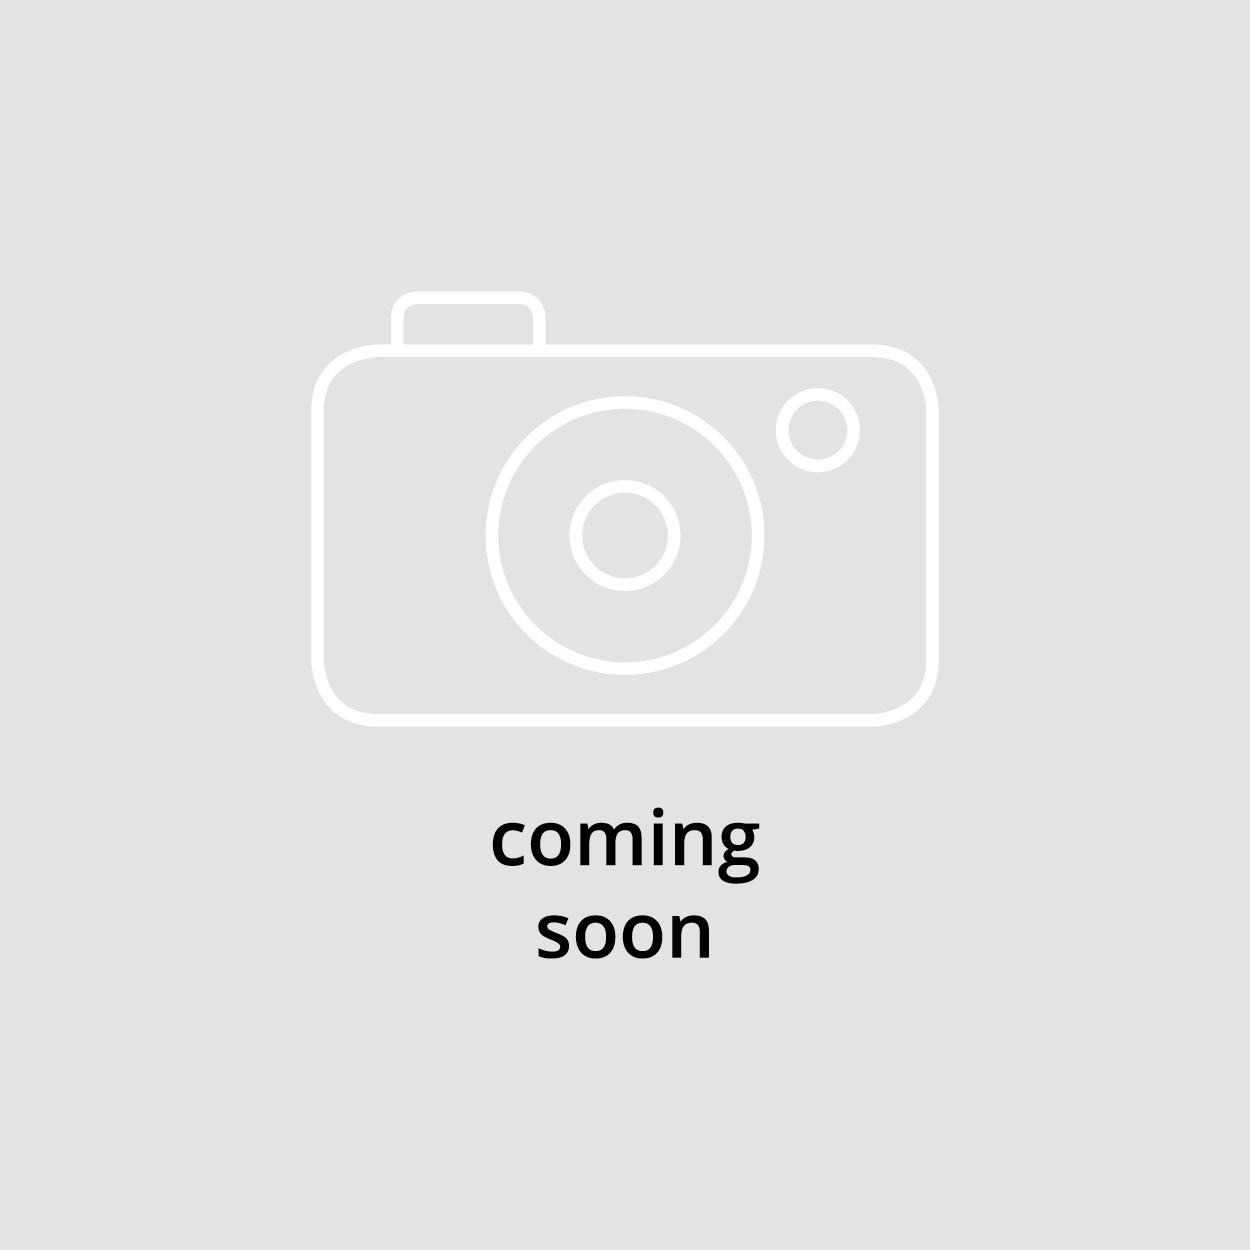 15.01.606, 1501606, 15 01 606, 0B1501606, Chiavetta  per tirante spingibarra variante 25mm Gildemeister AS20, GS20, GM20, GM20AC